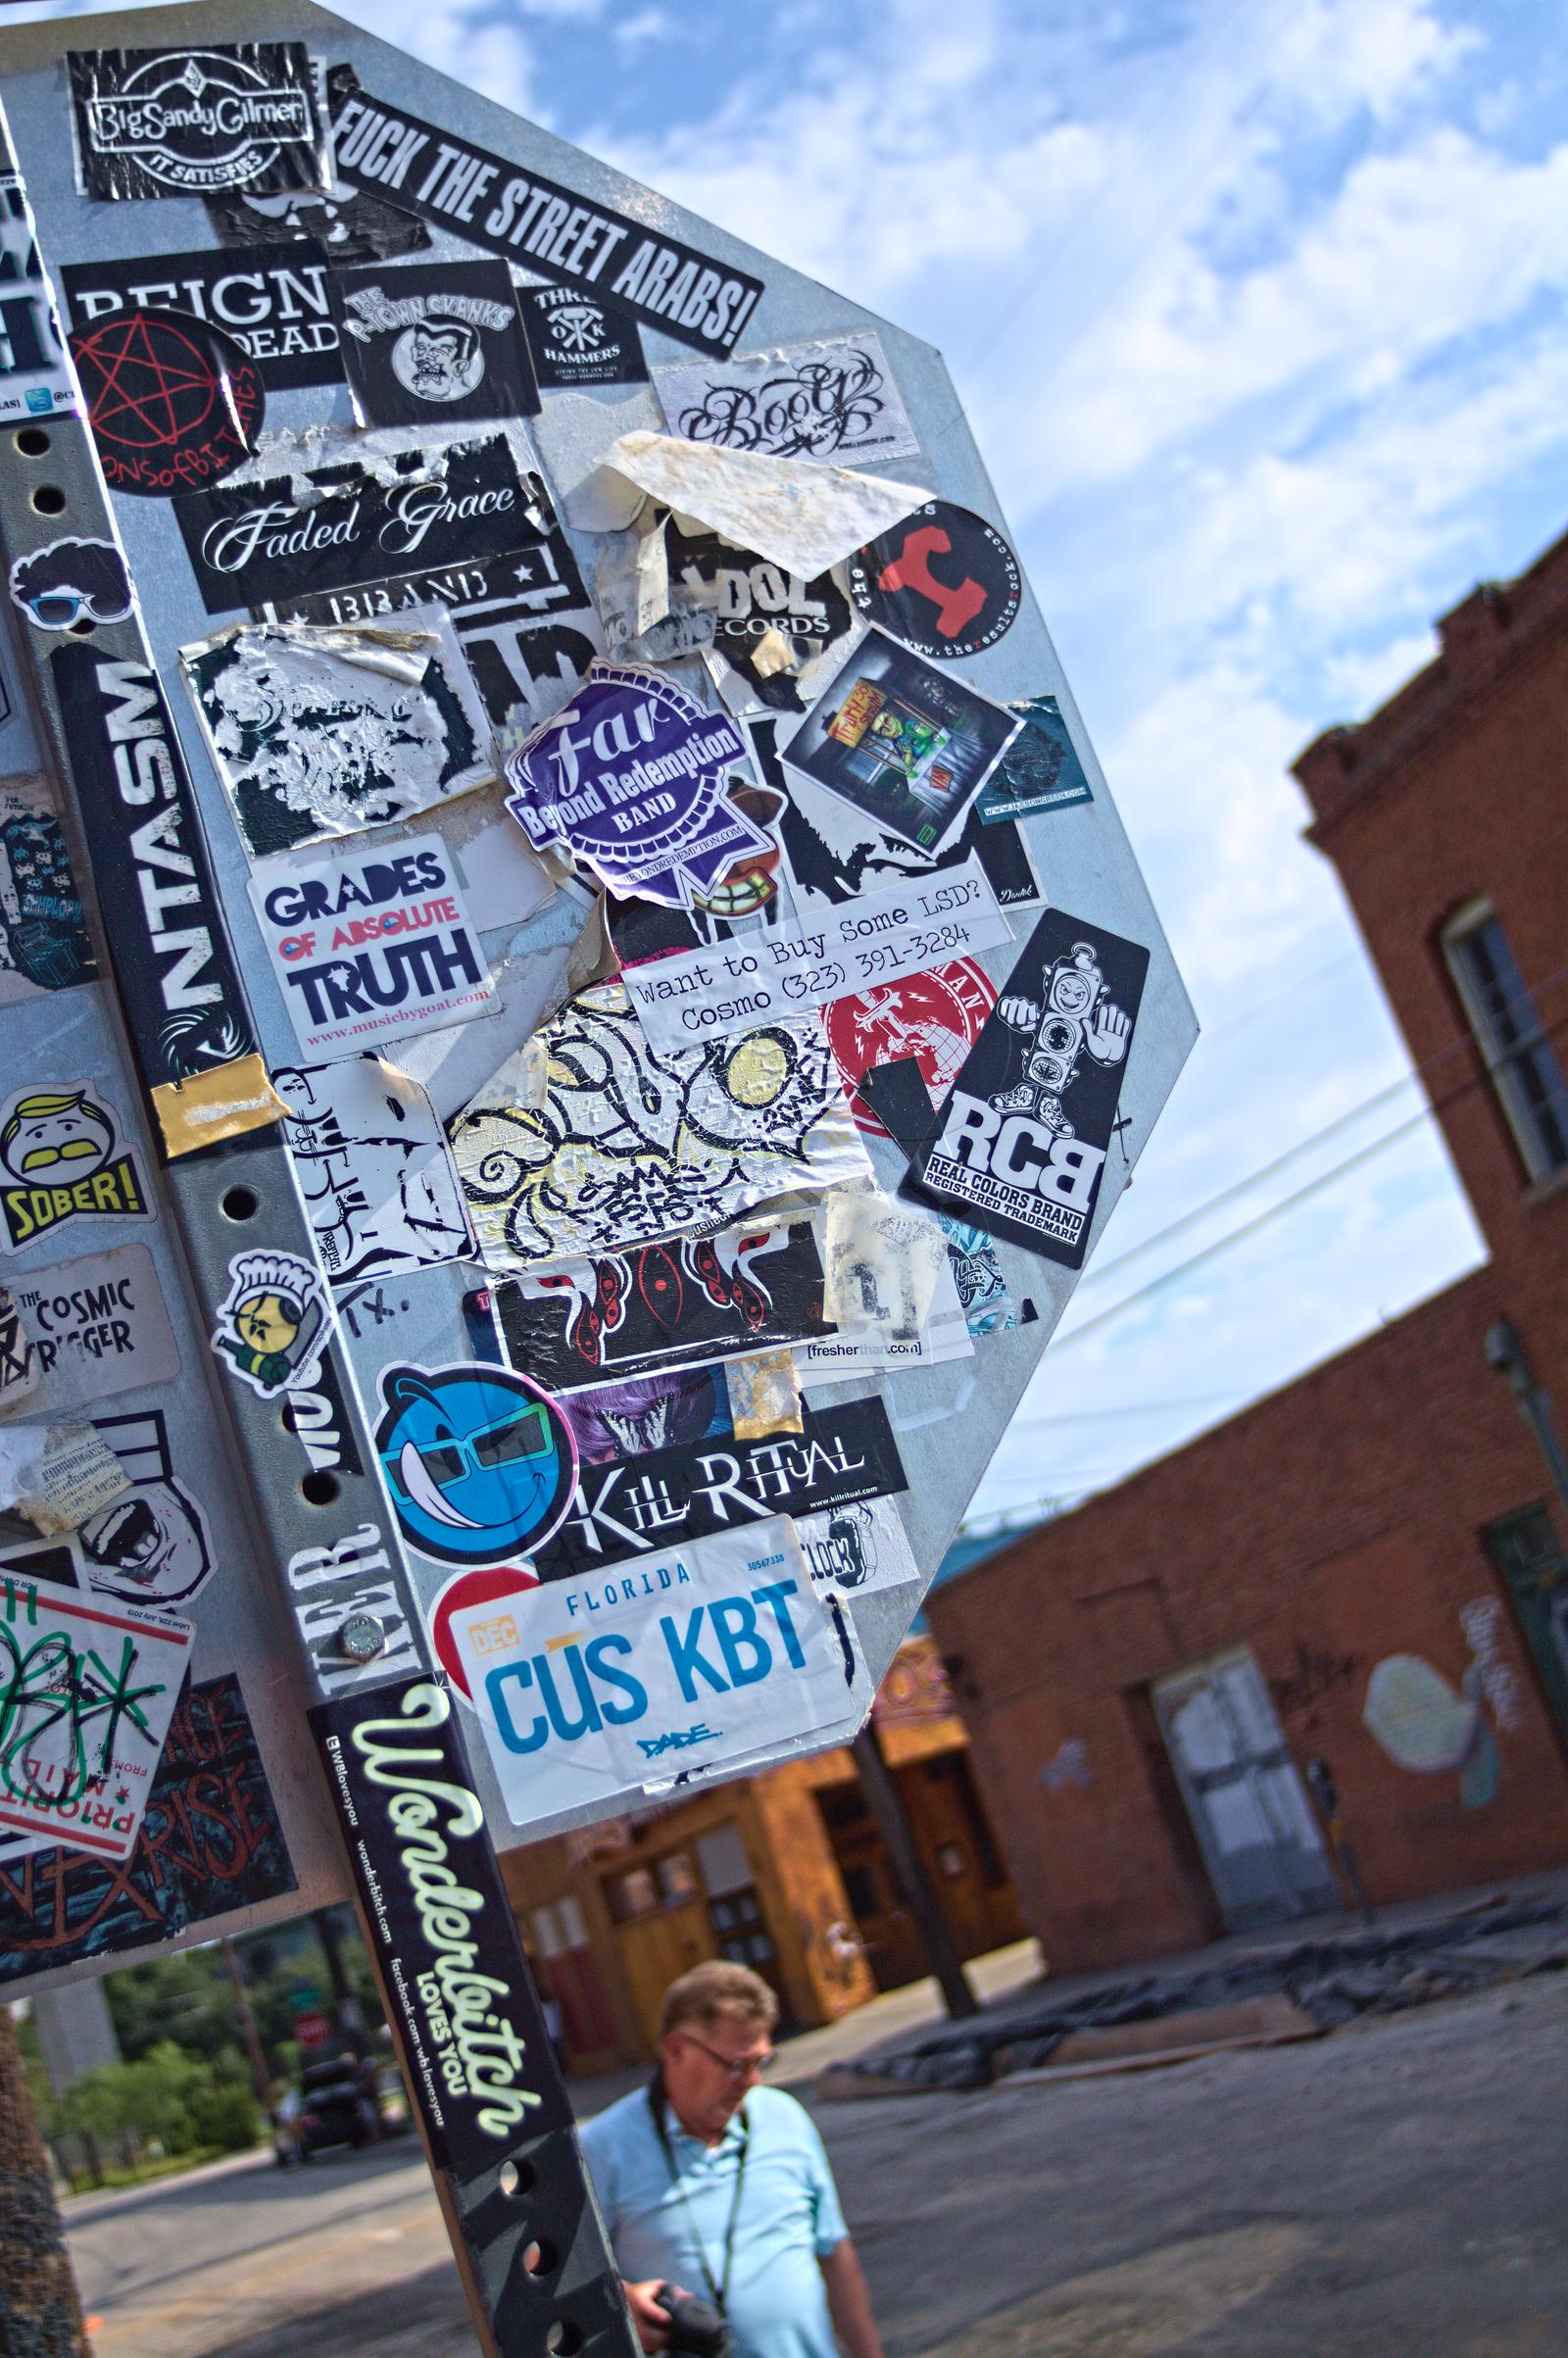 Stickers everywhere by DeepSlackerJazz